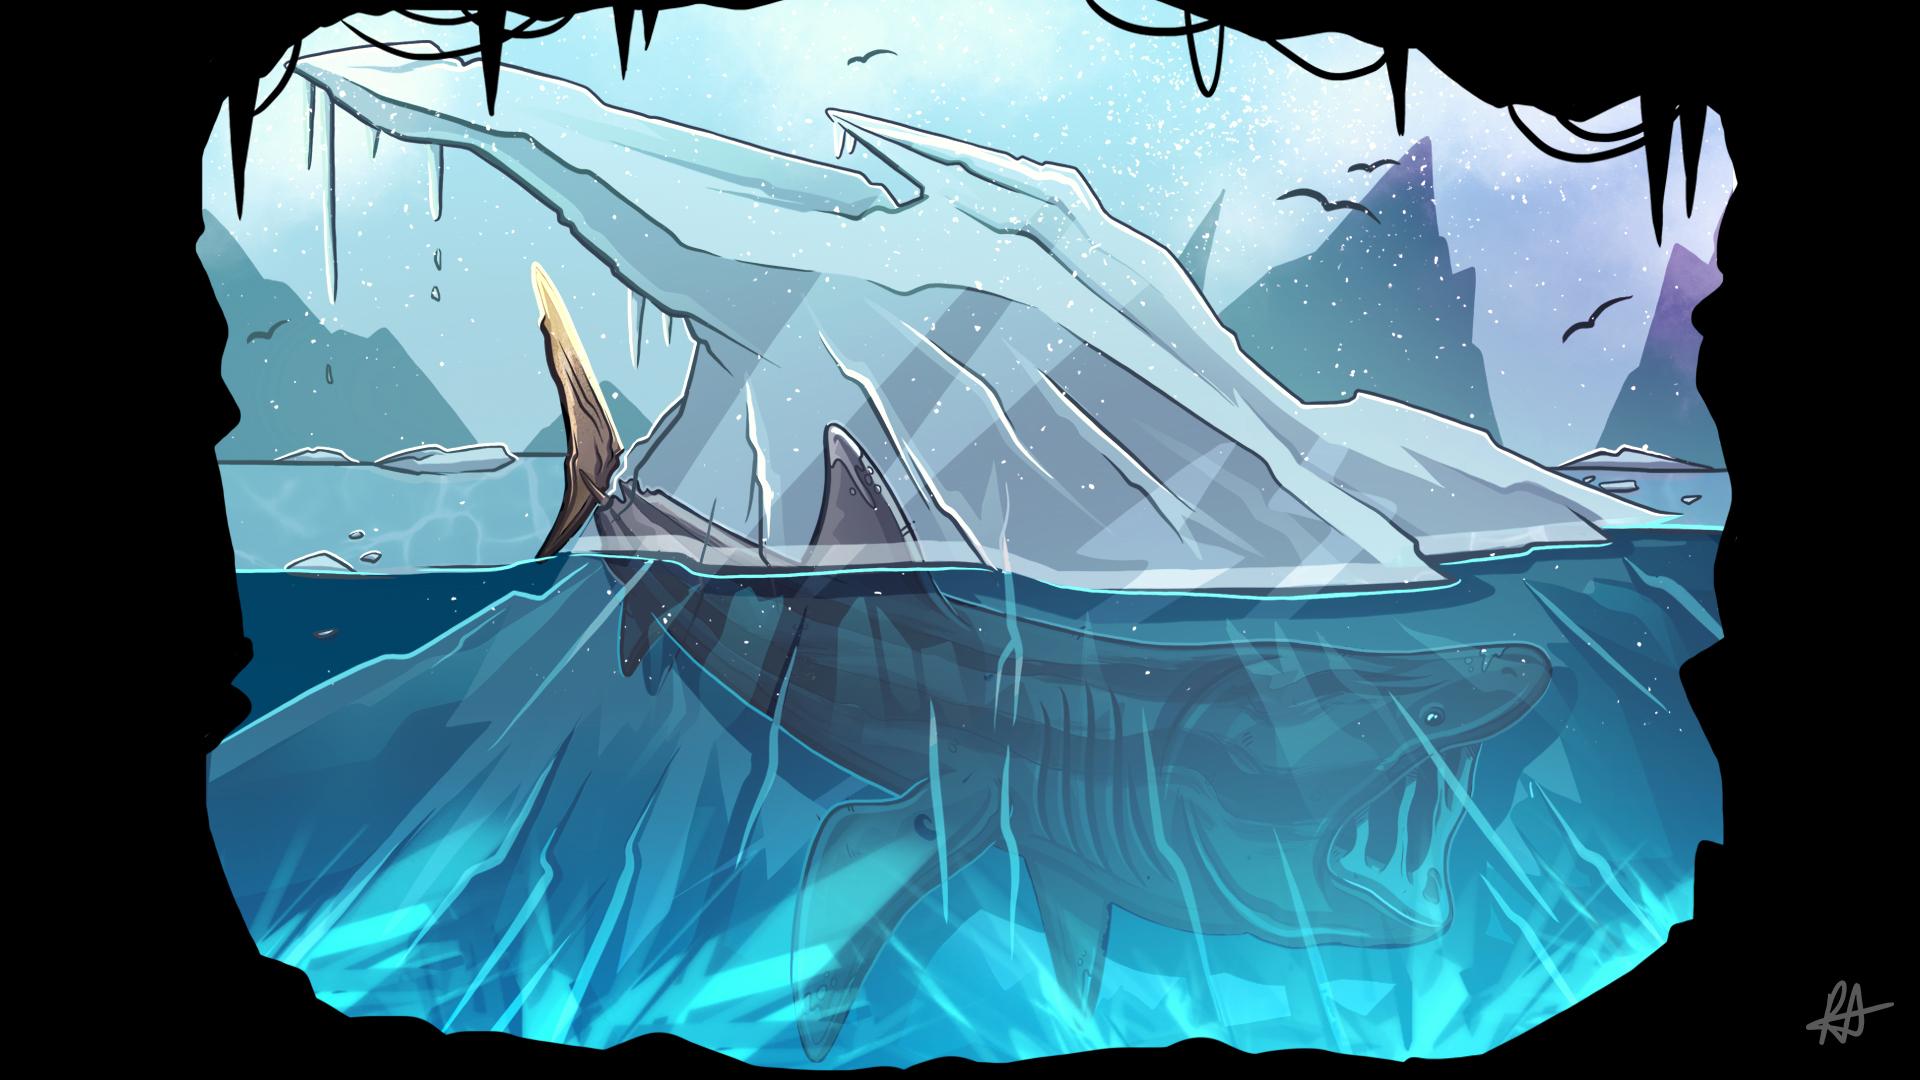 ice_shark_web.jpg